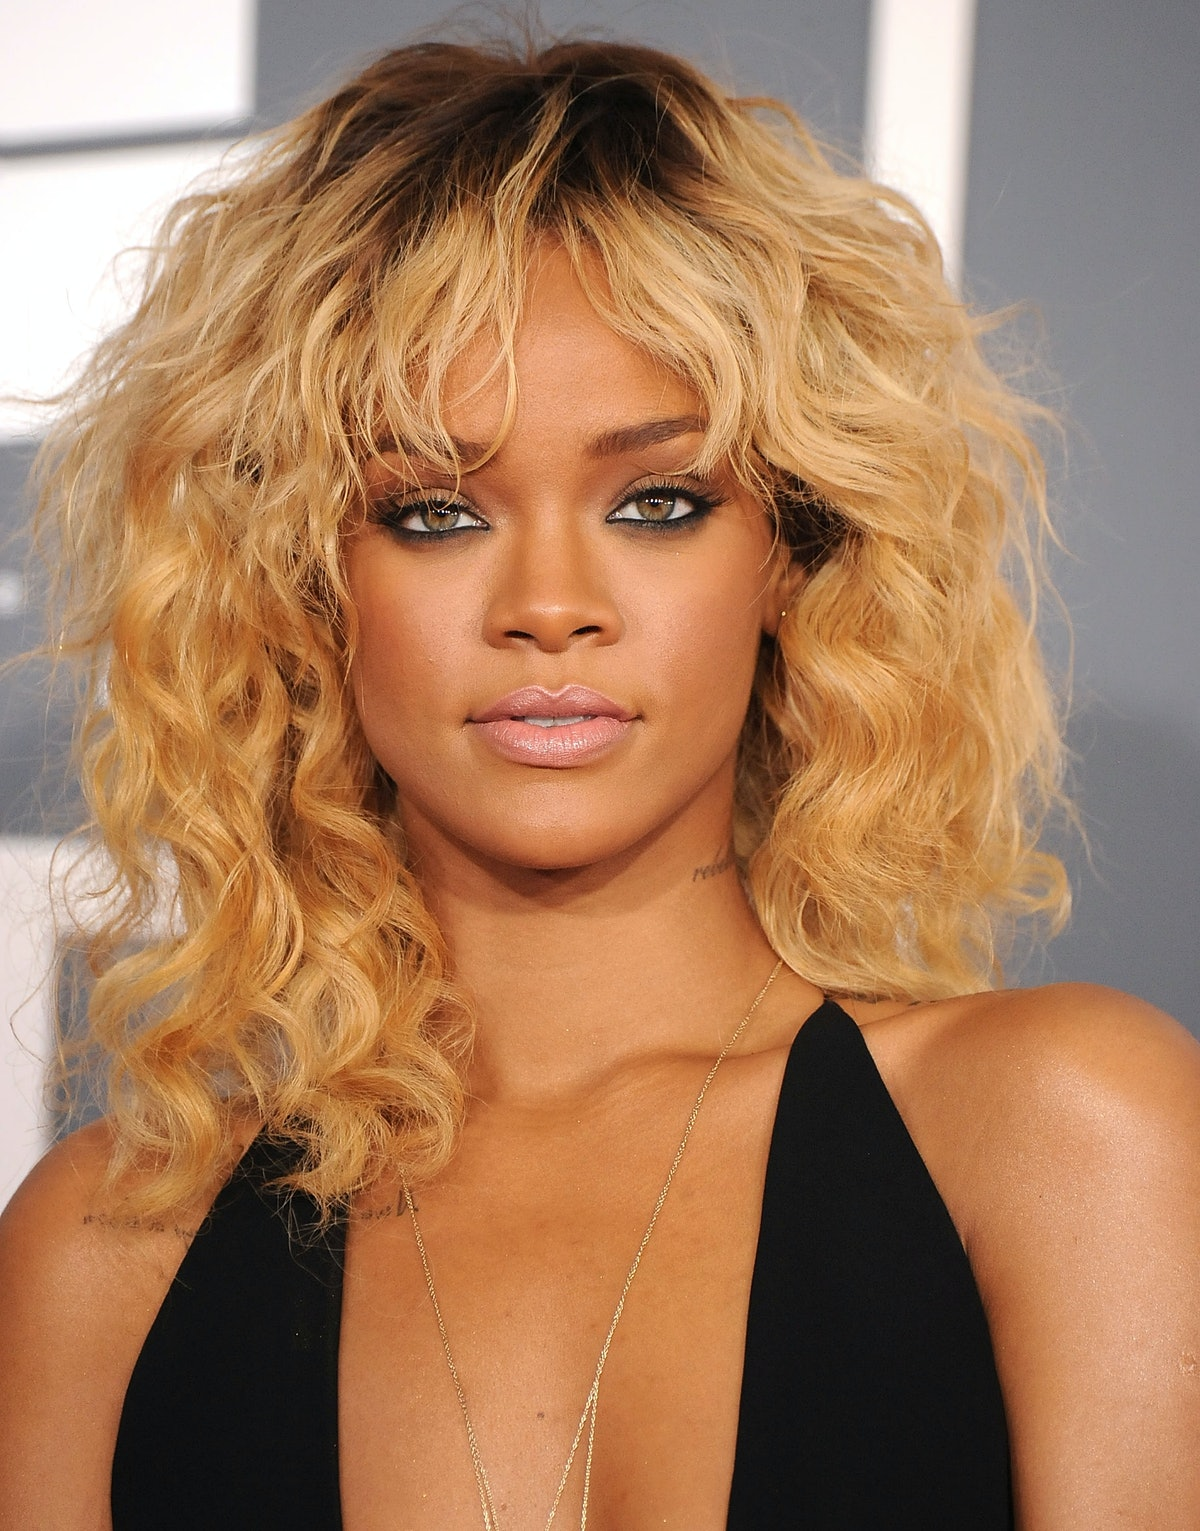 Rihanna at The 54th Annual GRAMMY Awards